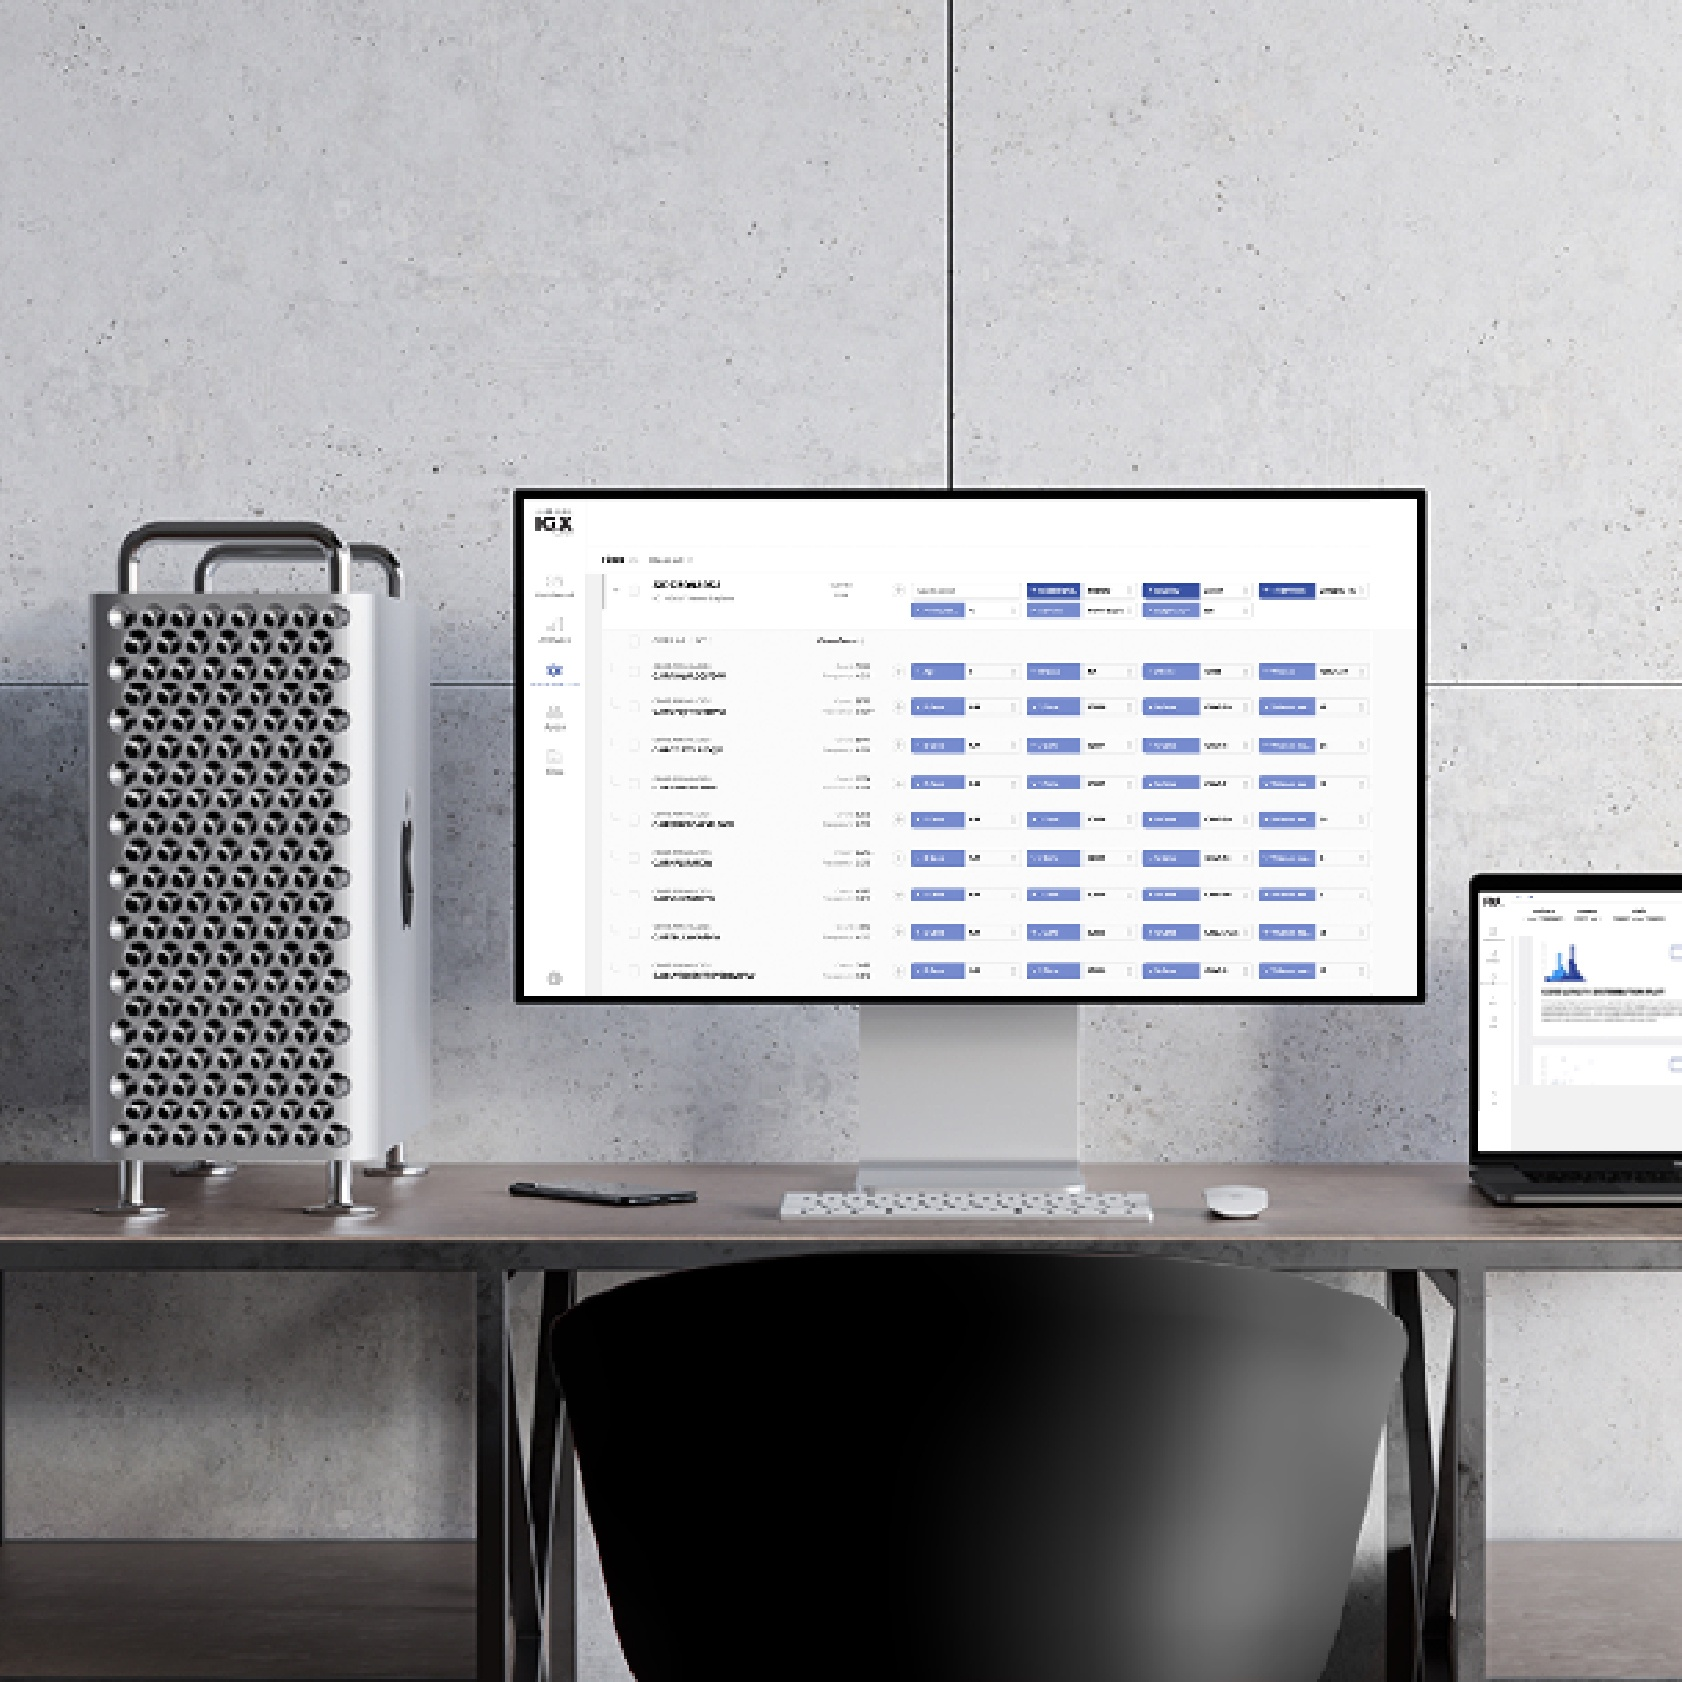 A desktop displaying the IGX Platform software